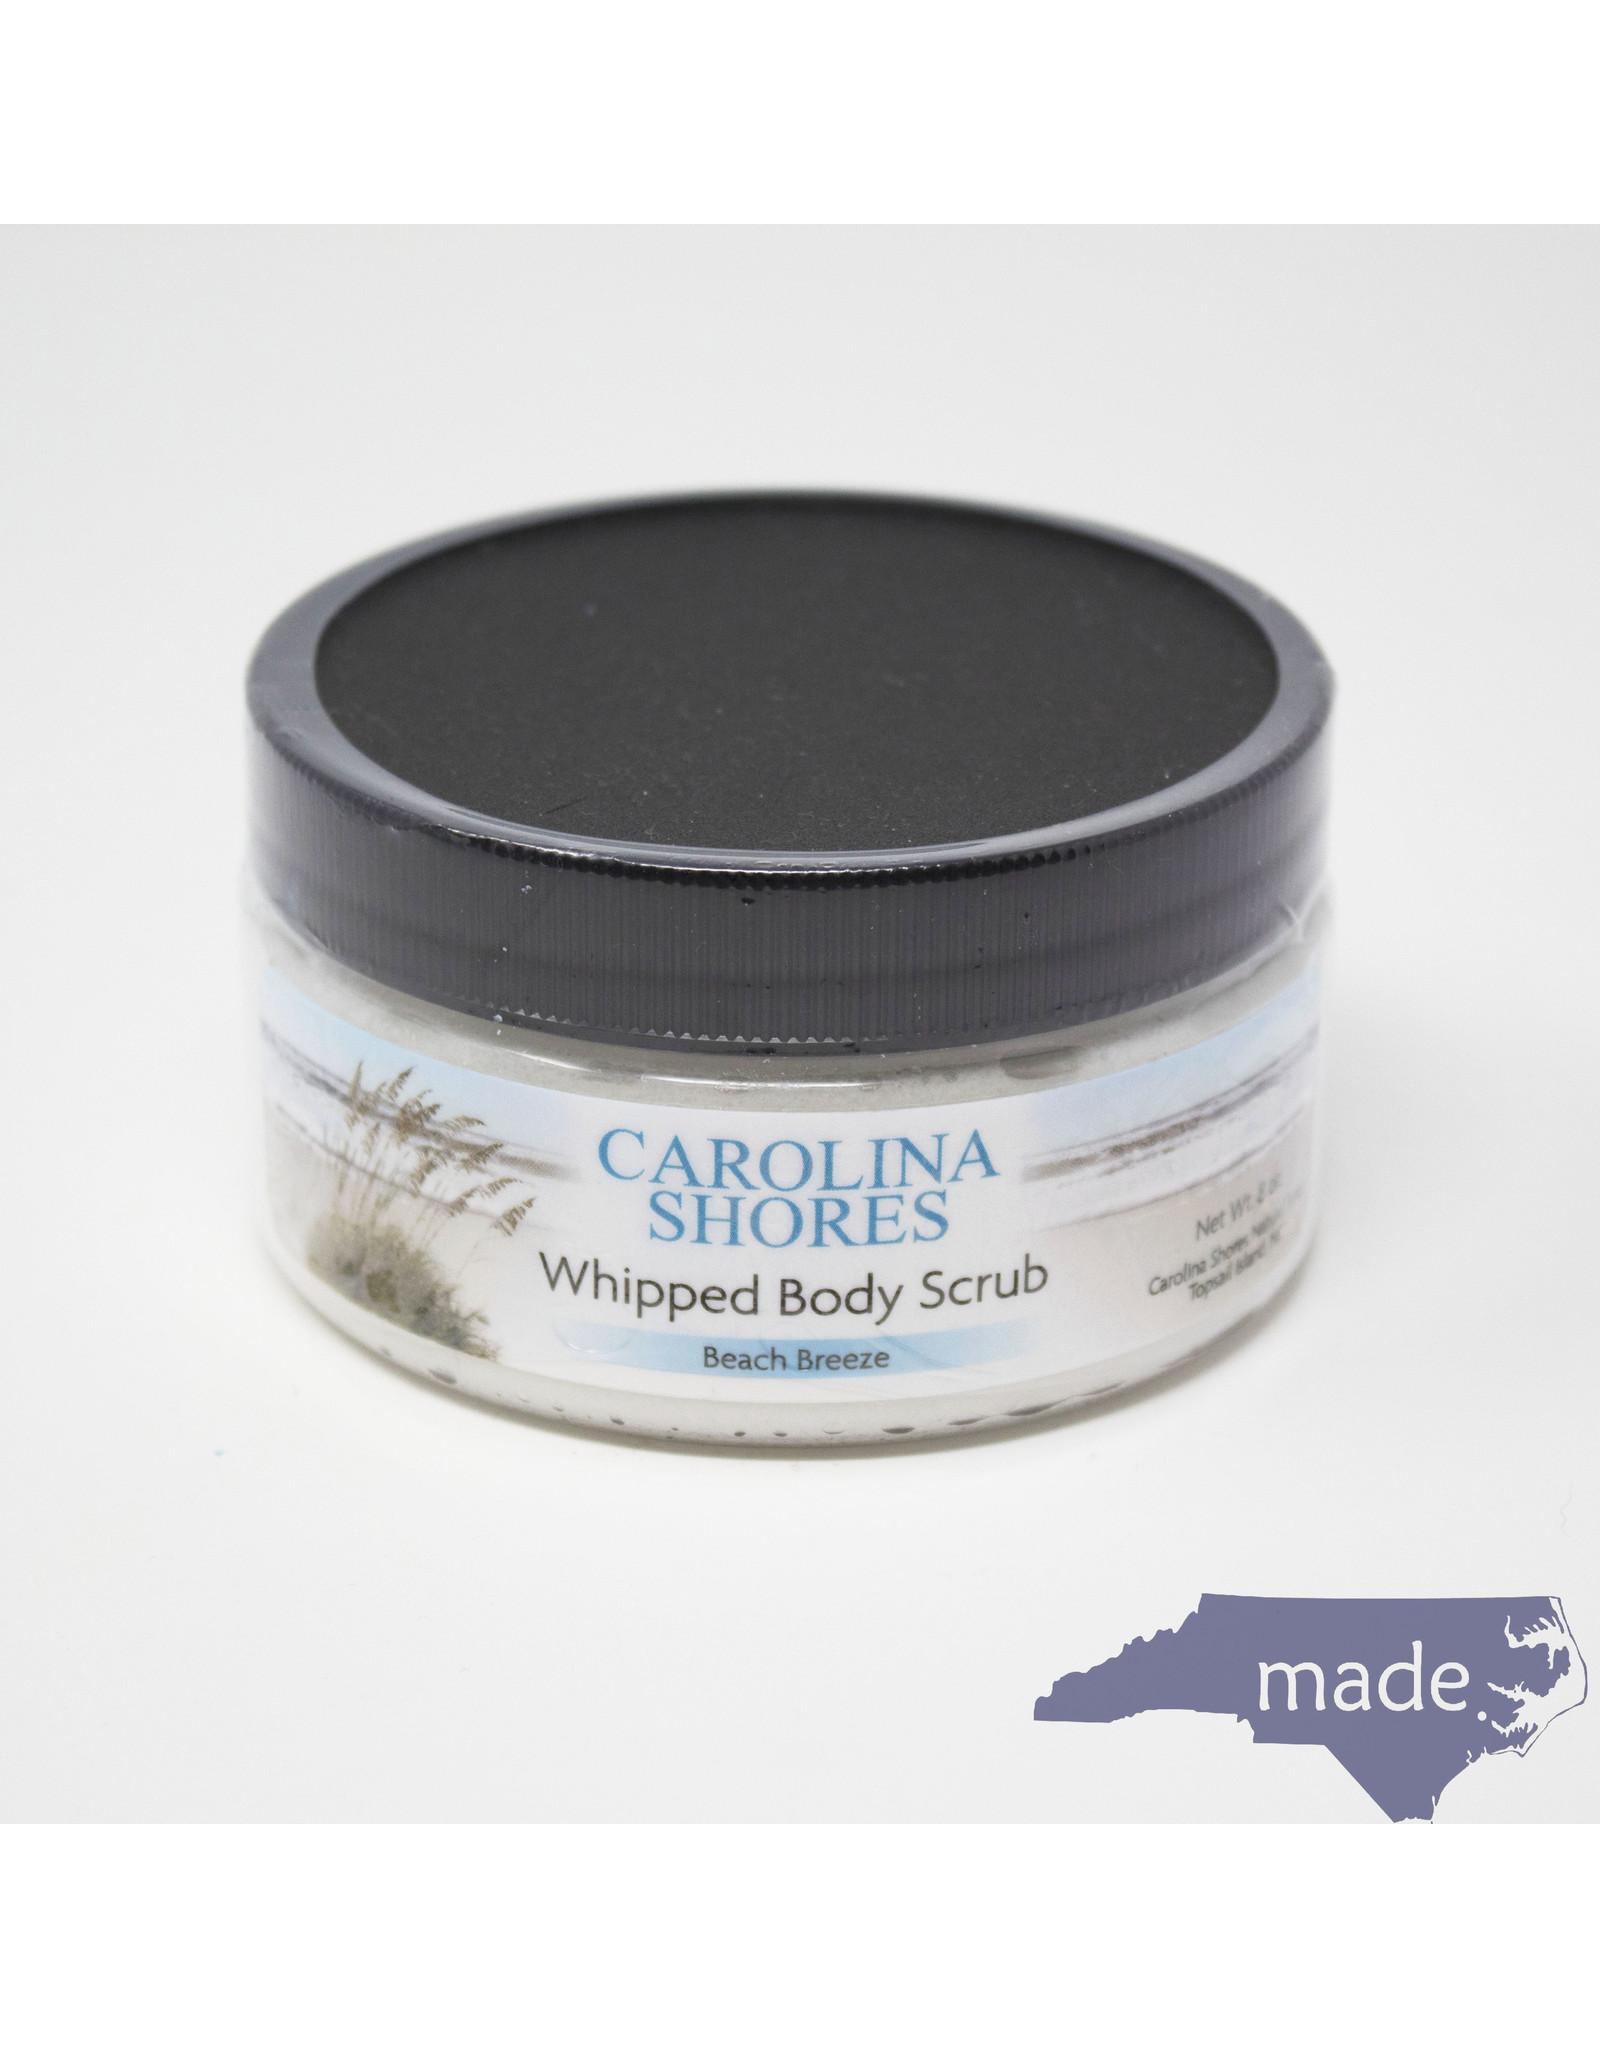 Carolina Shores Natural Soap Hand Whipped Body Scrub 8 oz. - Carolina Shores